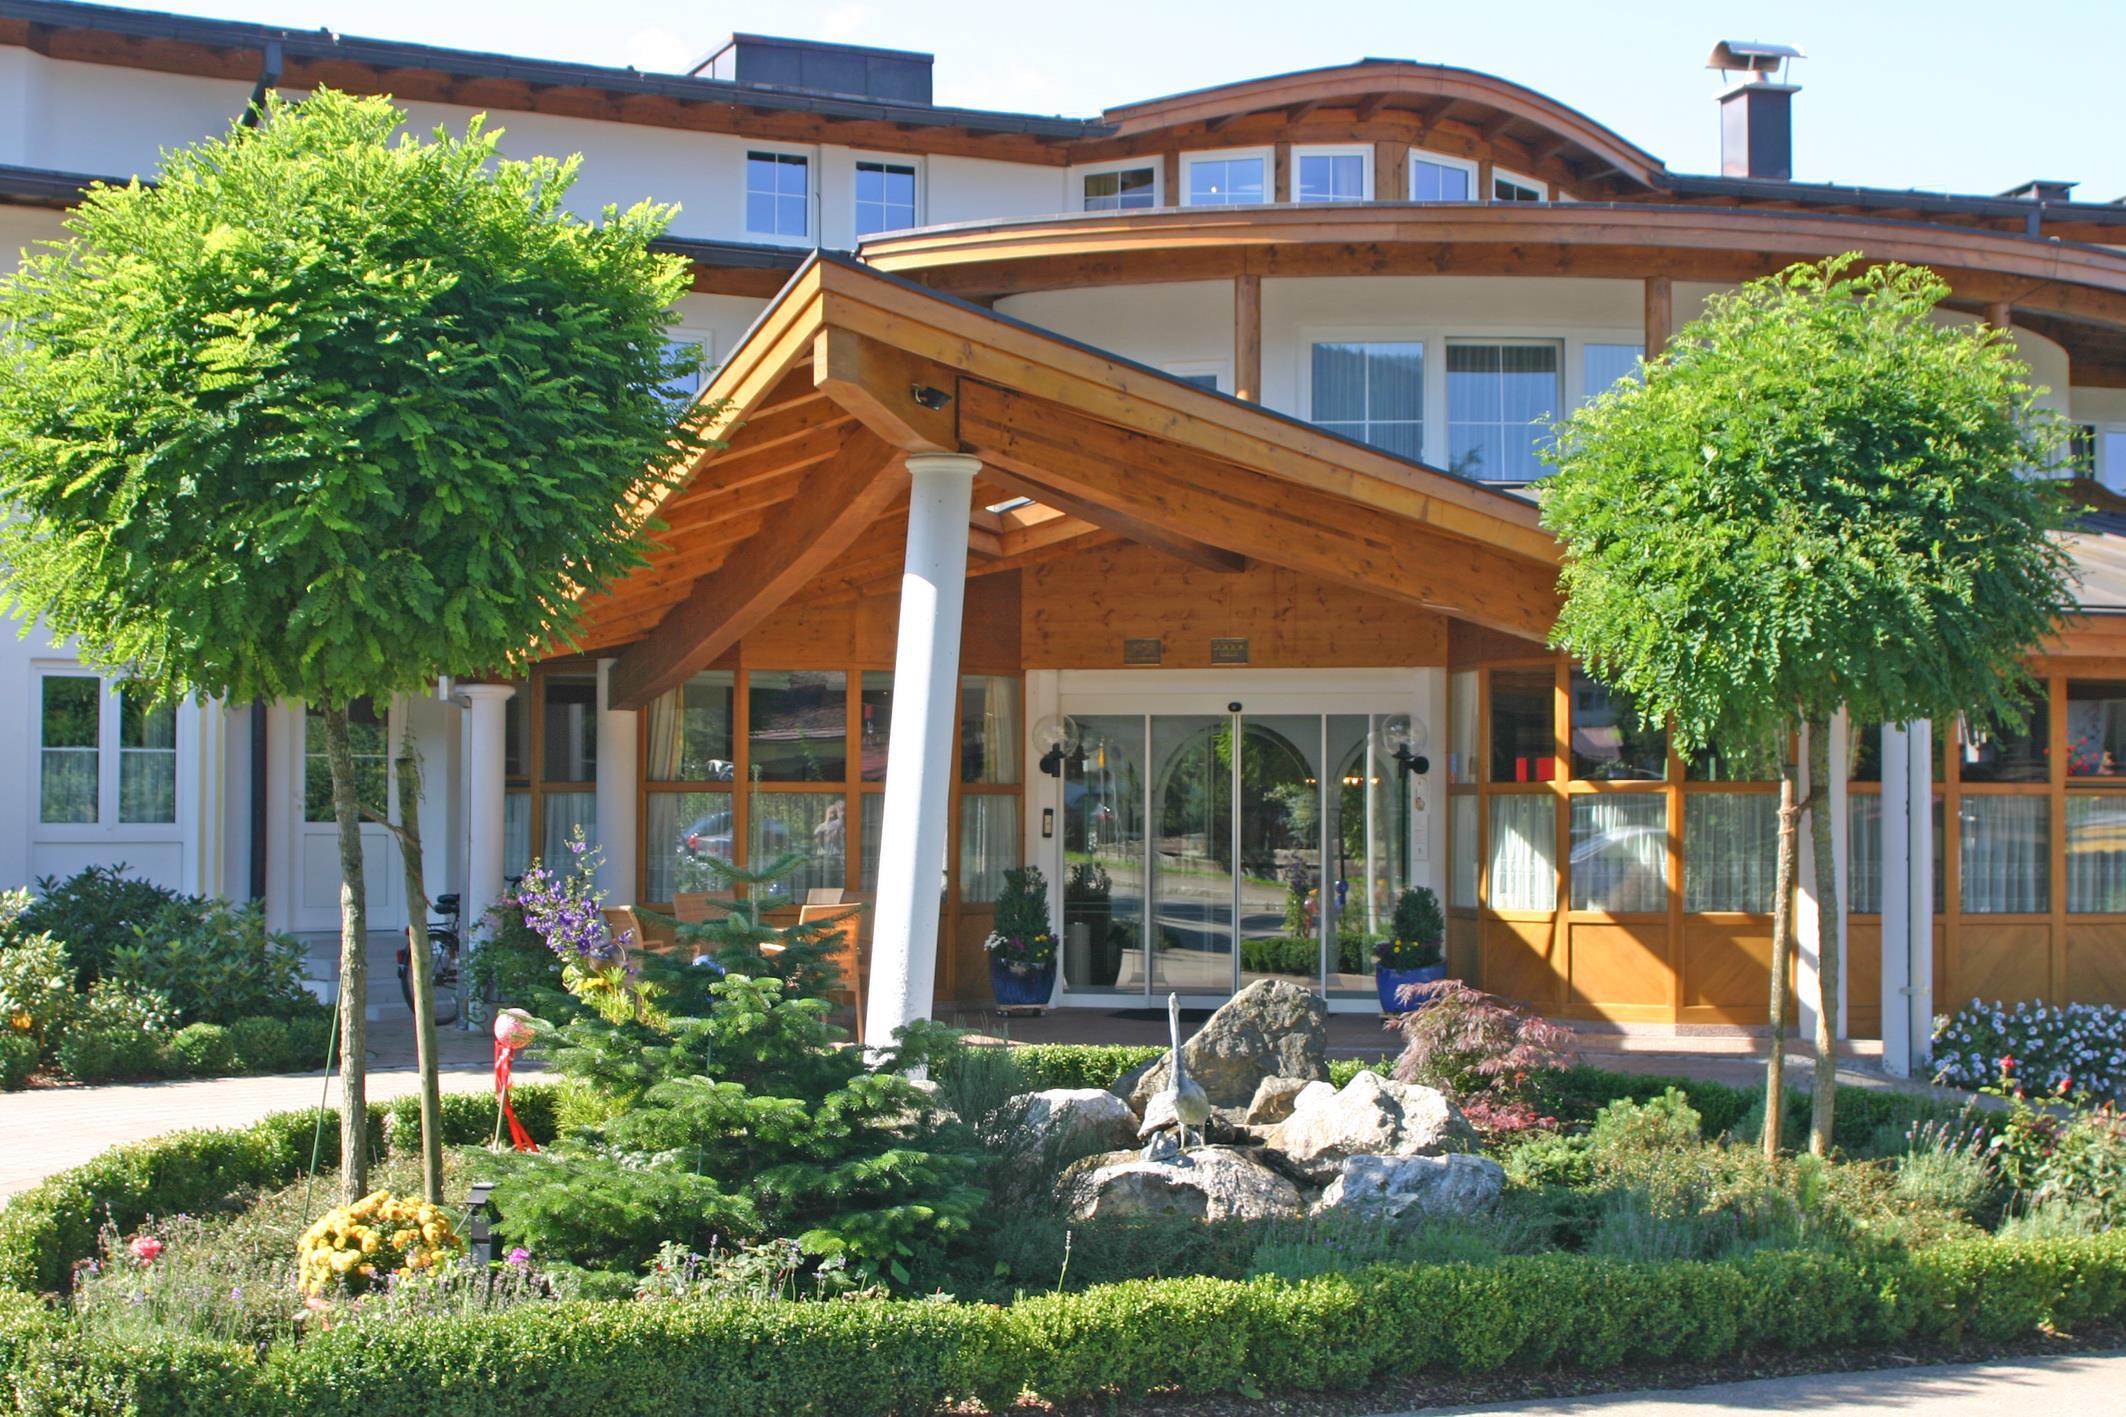 Hotel Wittelsbacher Hof Gmbh Co Kg